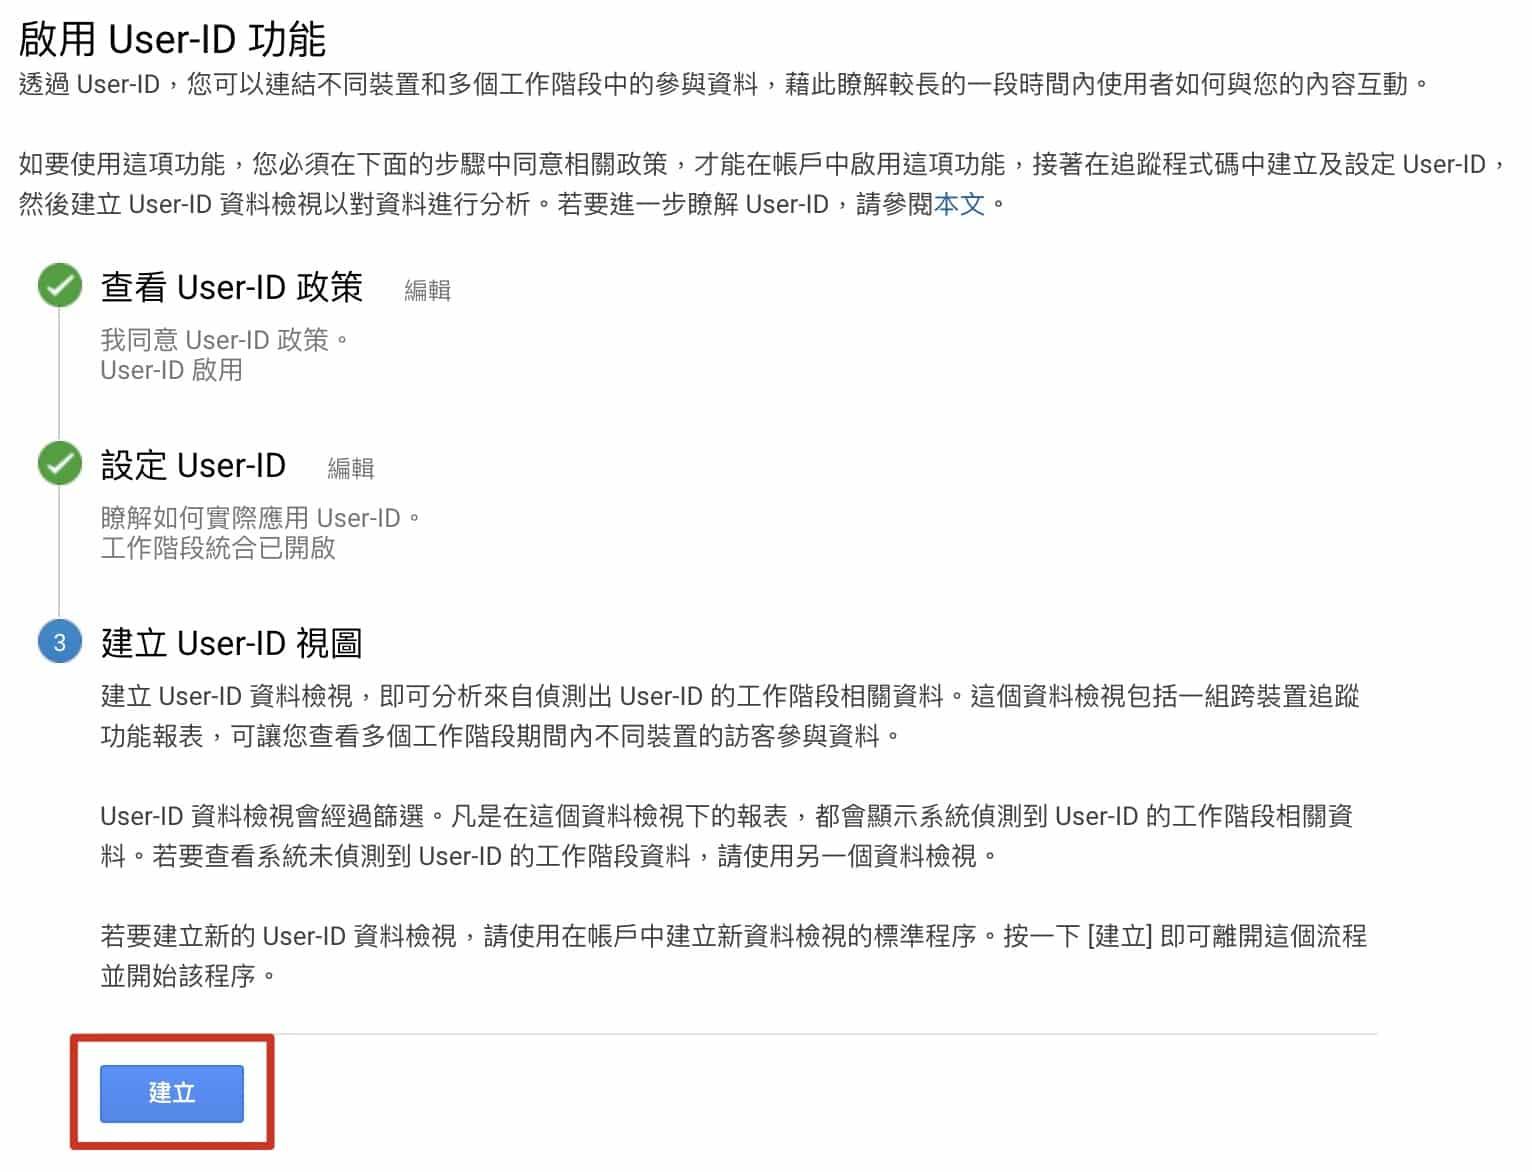 Step 4: 建立 user id 資料檢視。